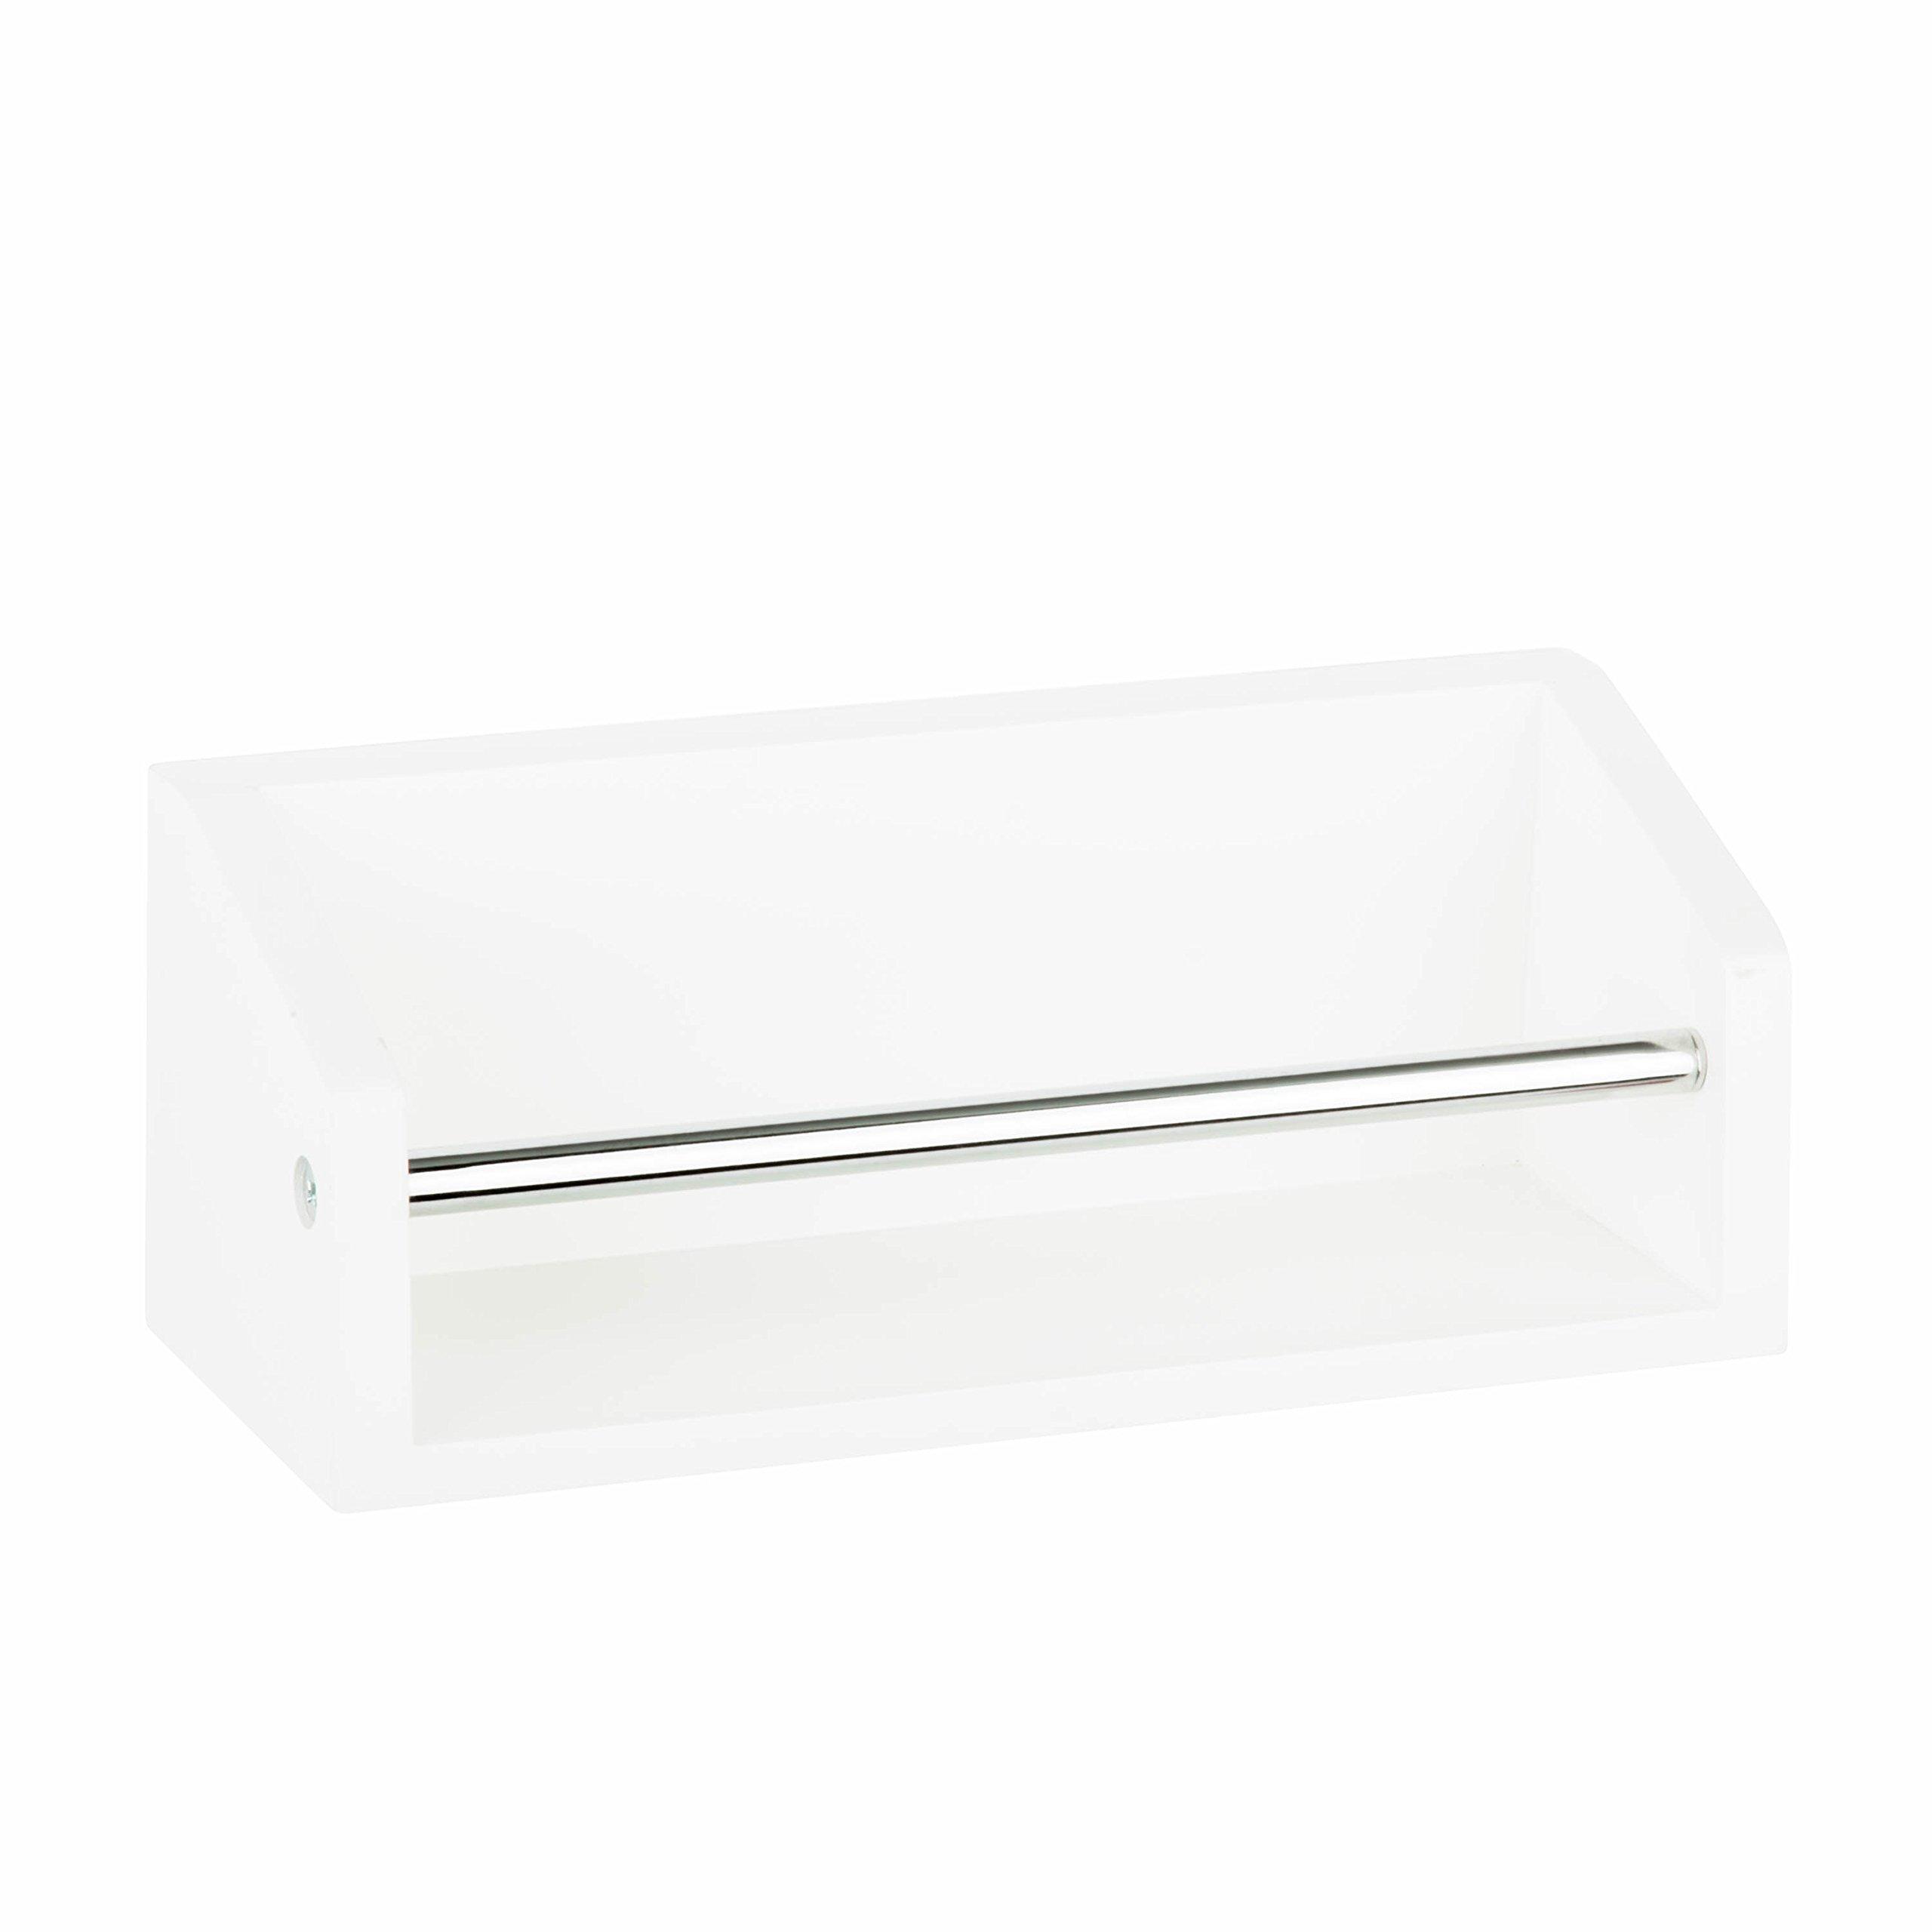 Honey-Can-Do SHF-04379 Wall Shelf with Chrome Bar